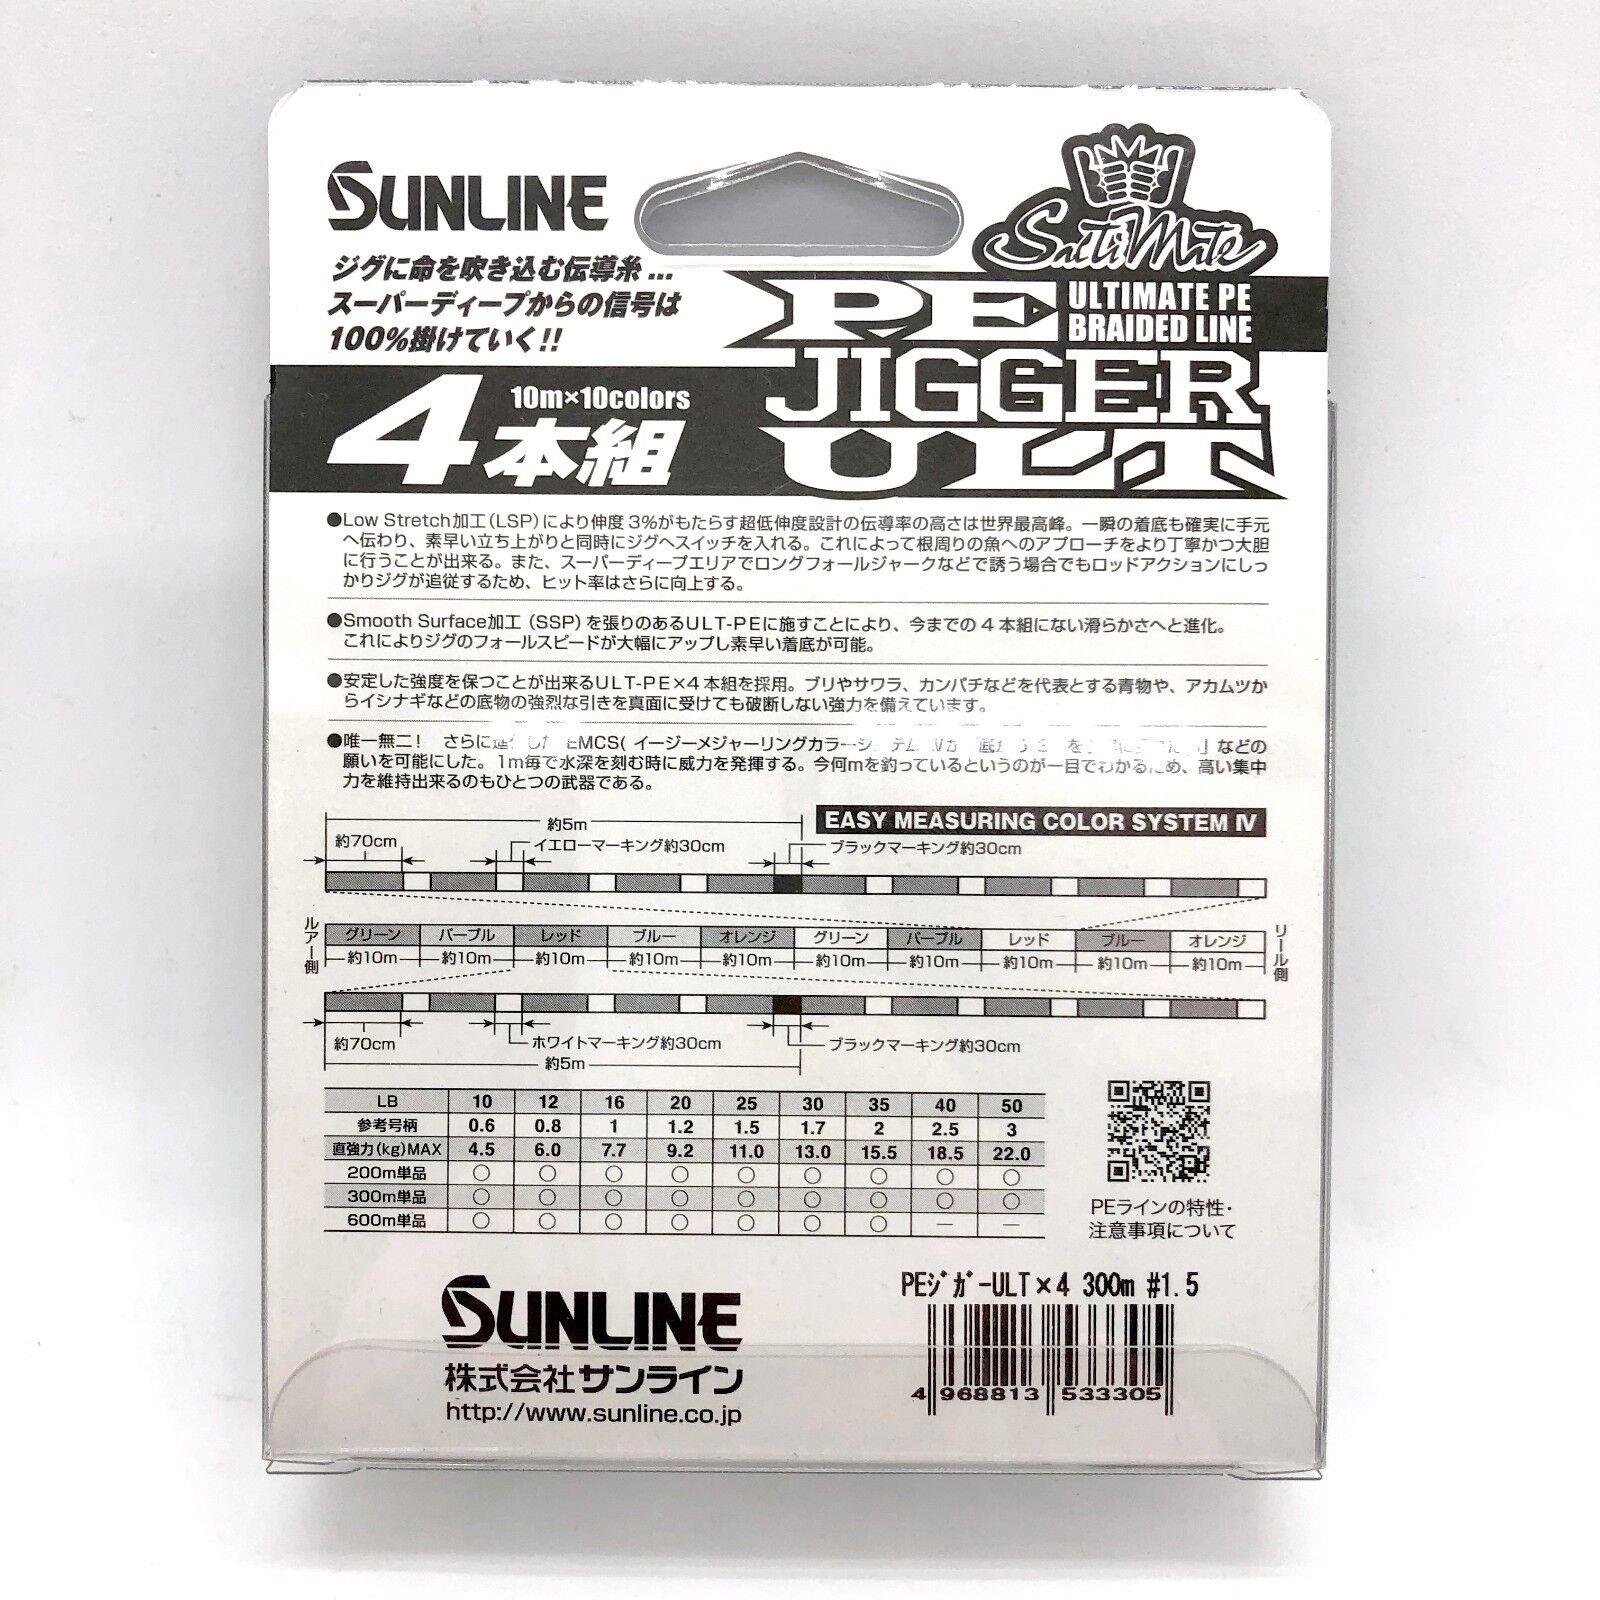 SUNLINE SaltiMate PE JIGGER ULT PE X4 Braided Line Line Line 300m Select LB 68490f